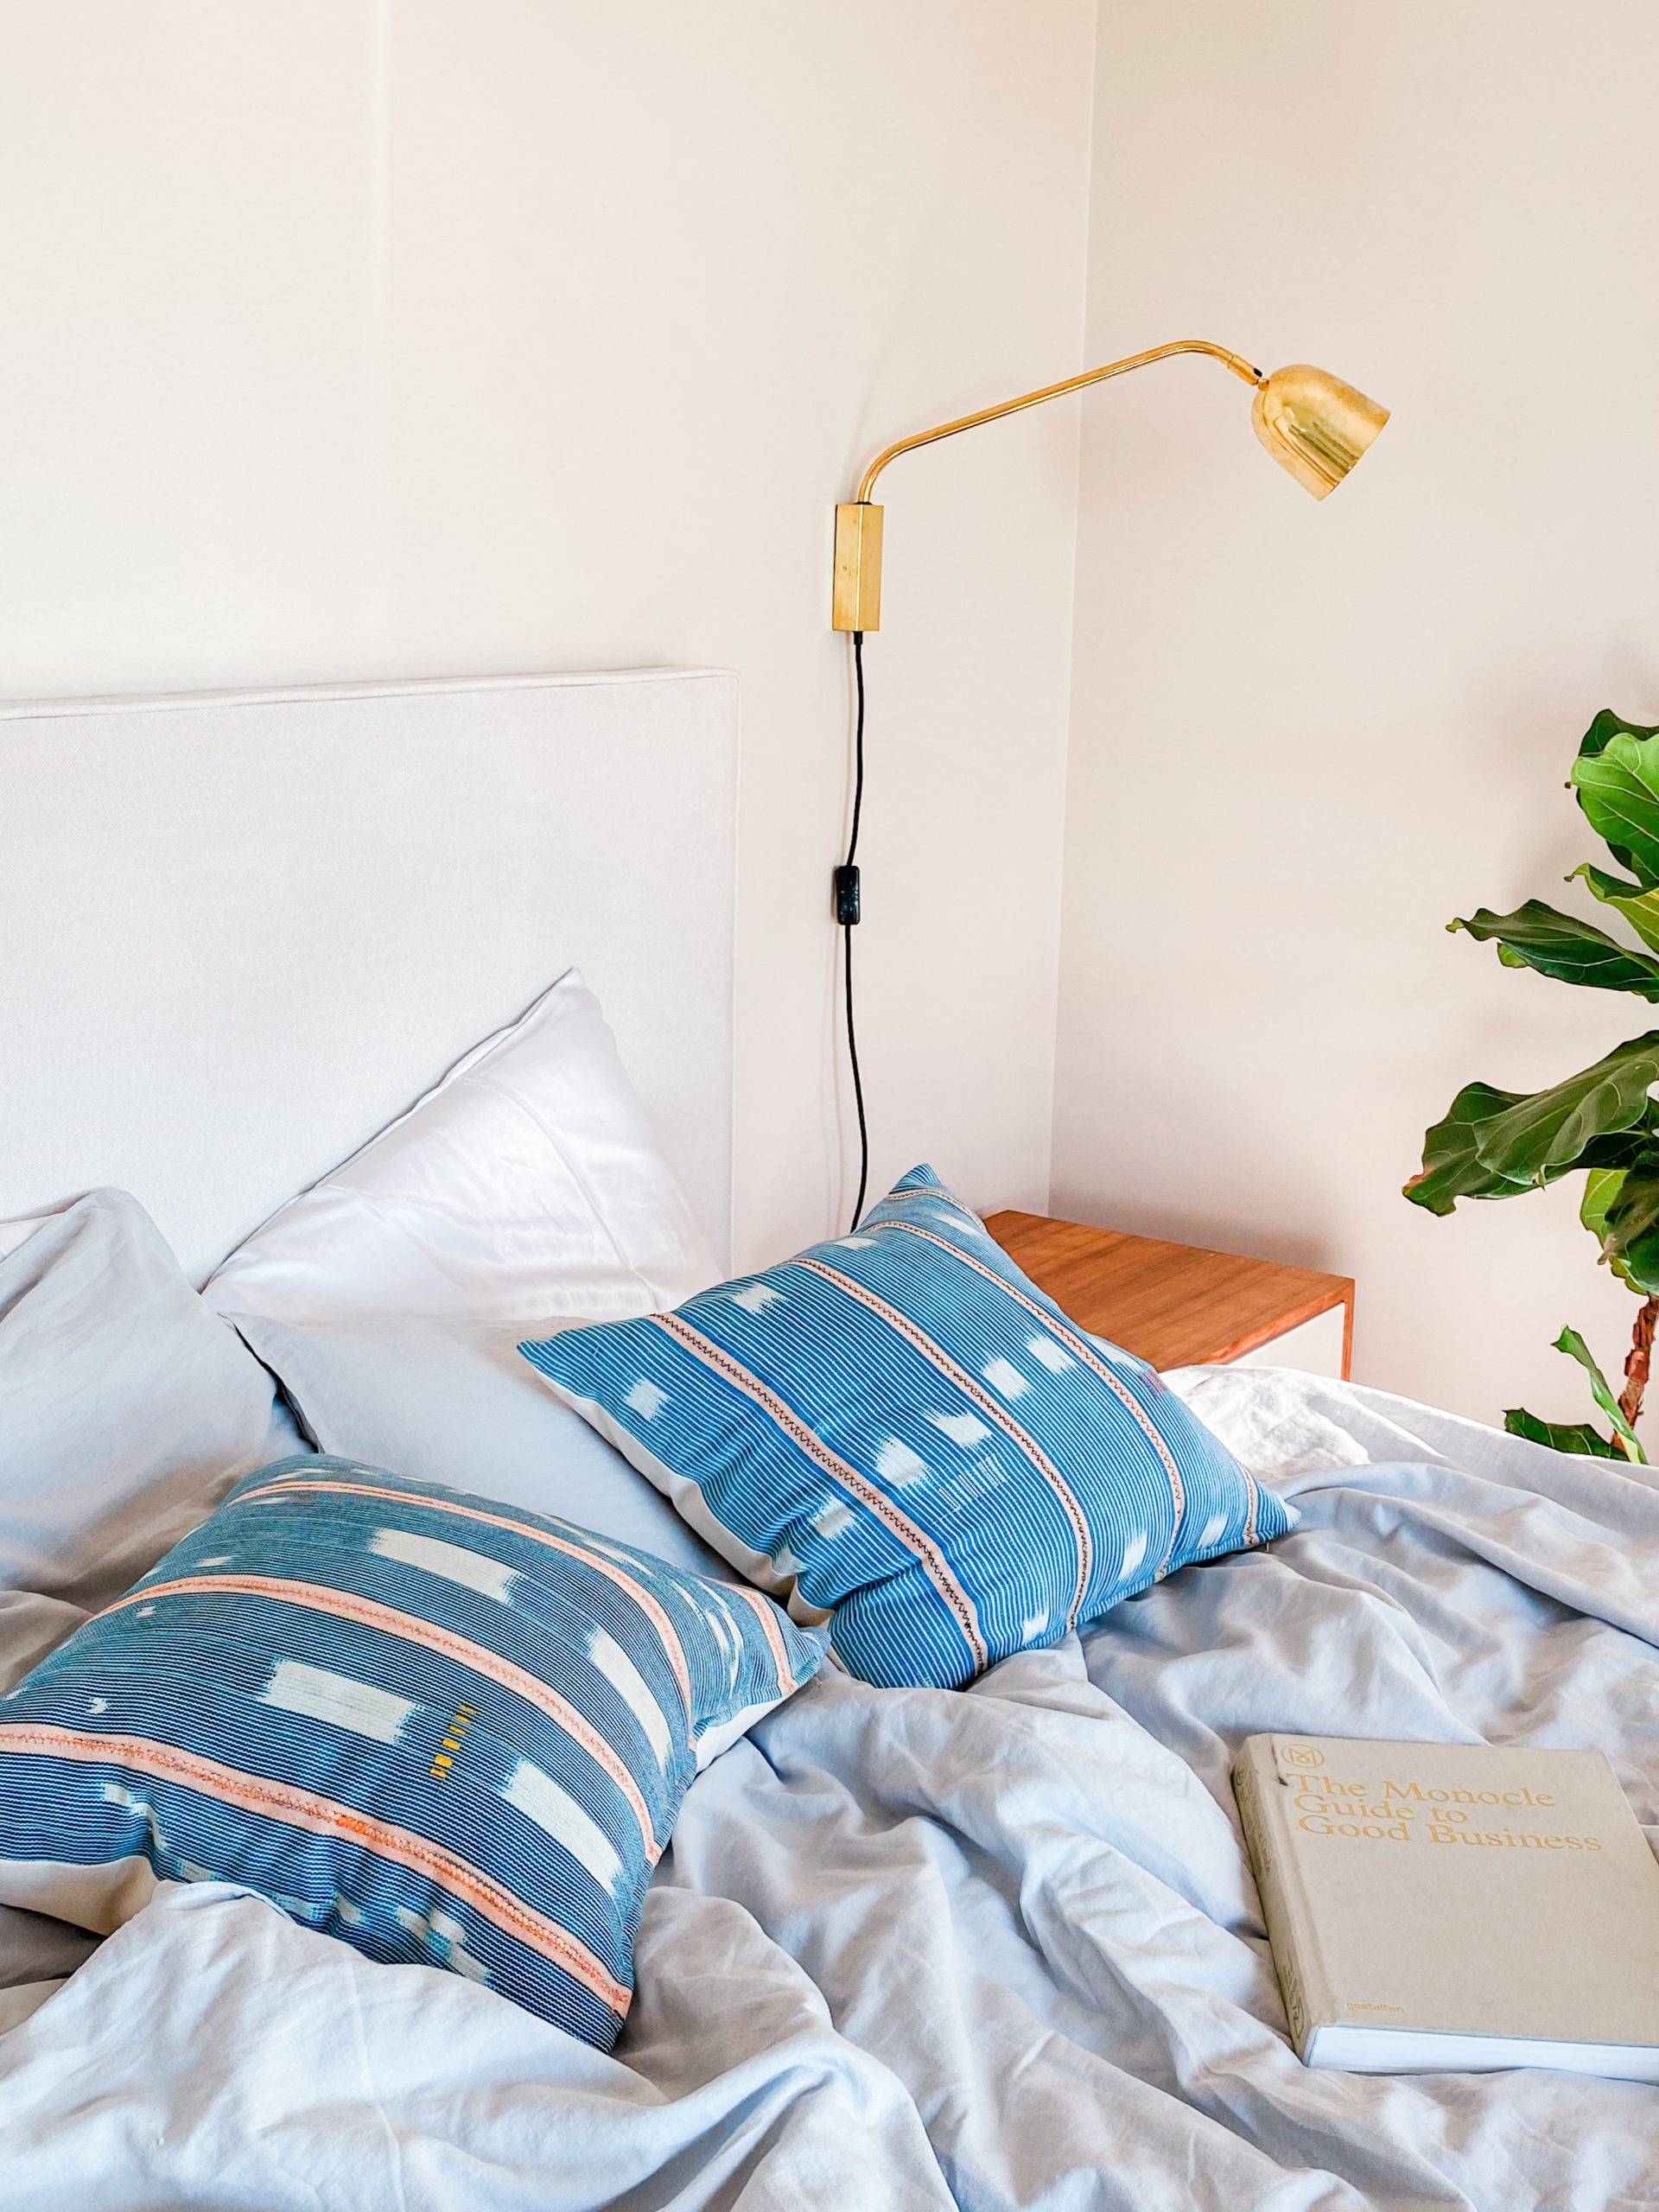 Baule pillow mudcloth throw pillow indigo Spases South Africa